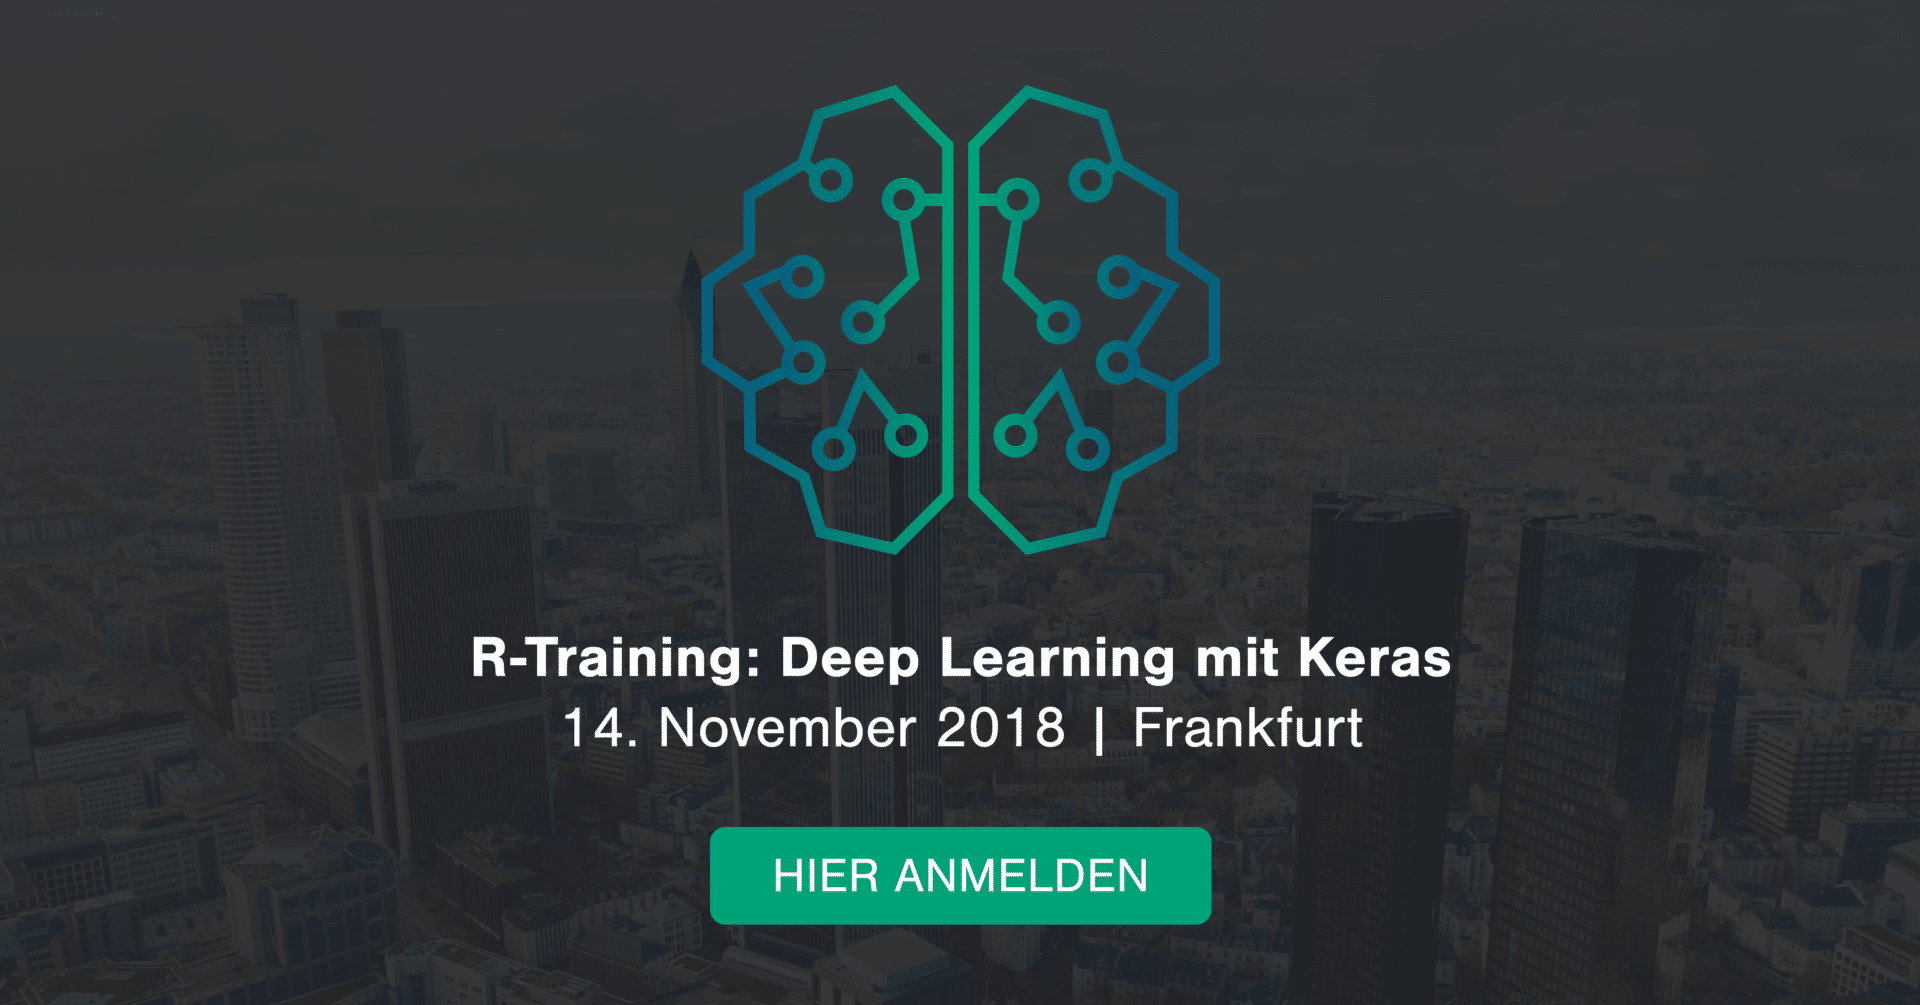 Open Workshop: Deep Learning in R and Keras, November 14th in Frankfurt